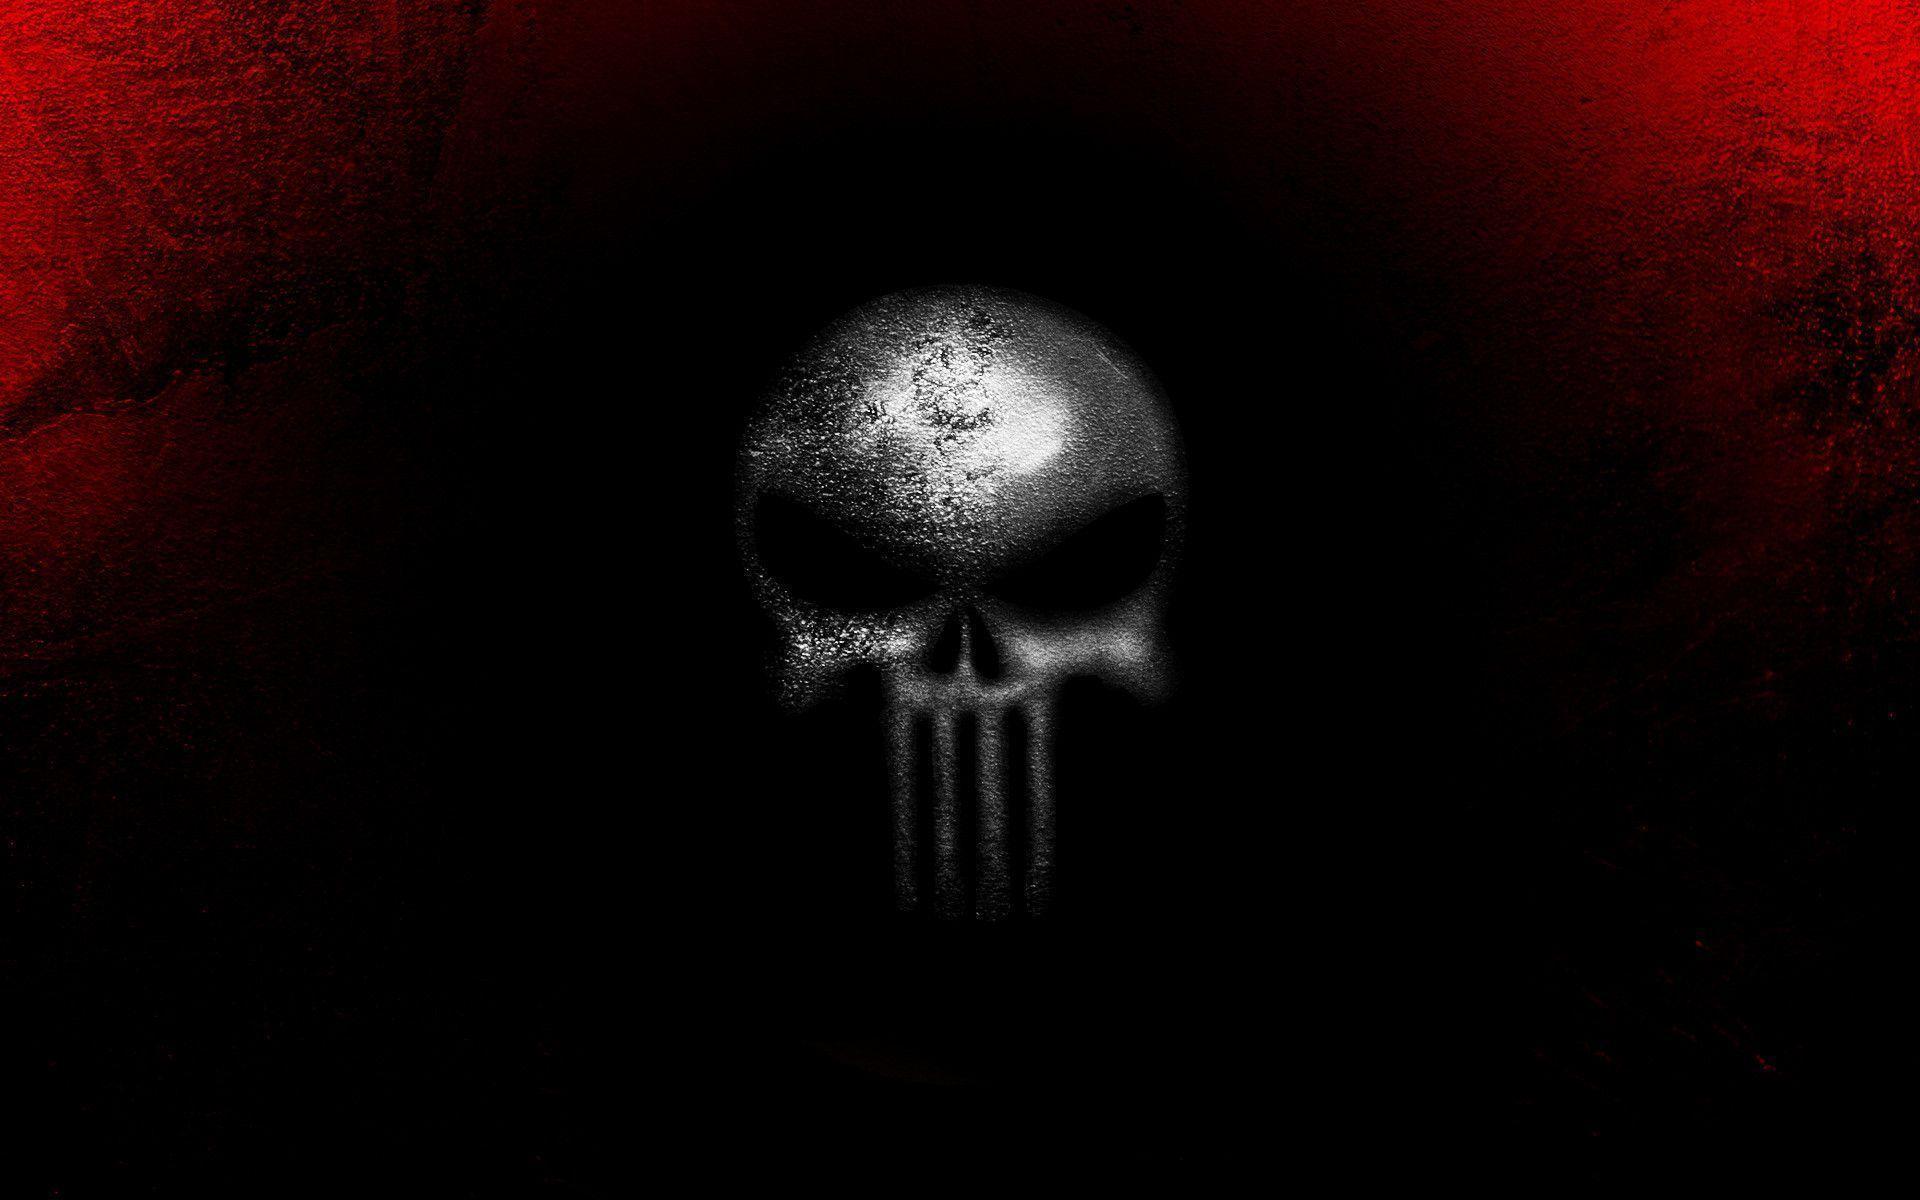 Download Punisher Skull Wallpaper Gallery